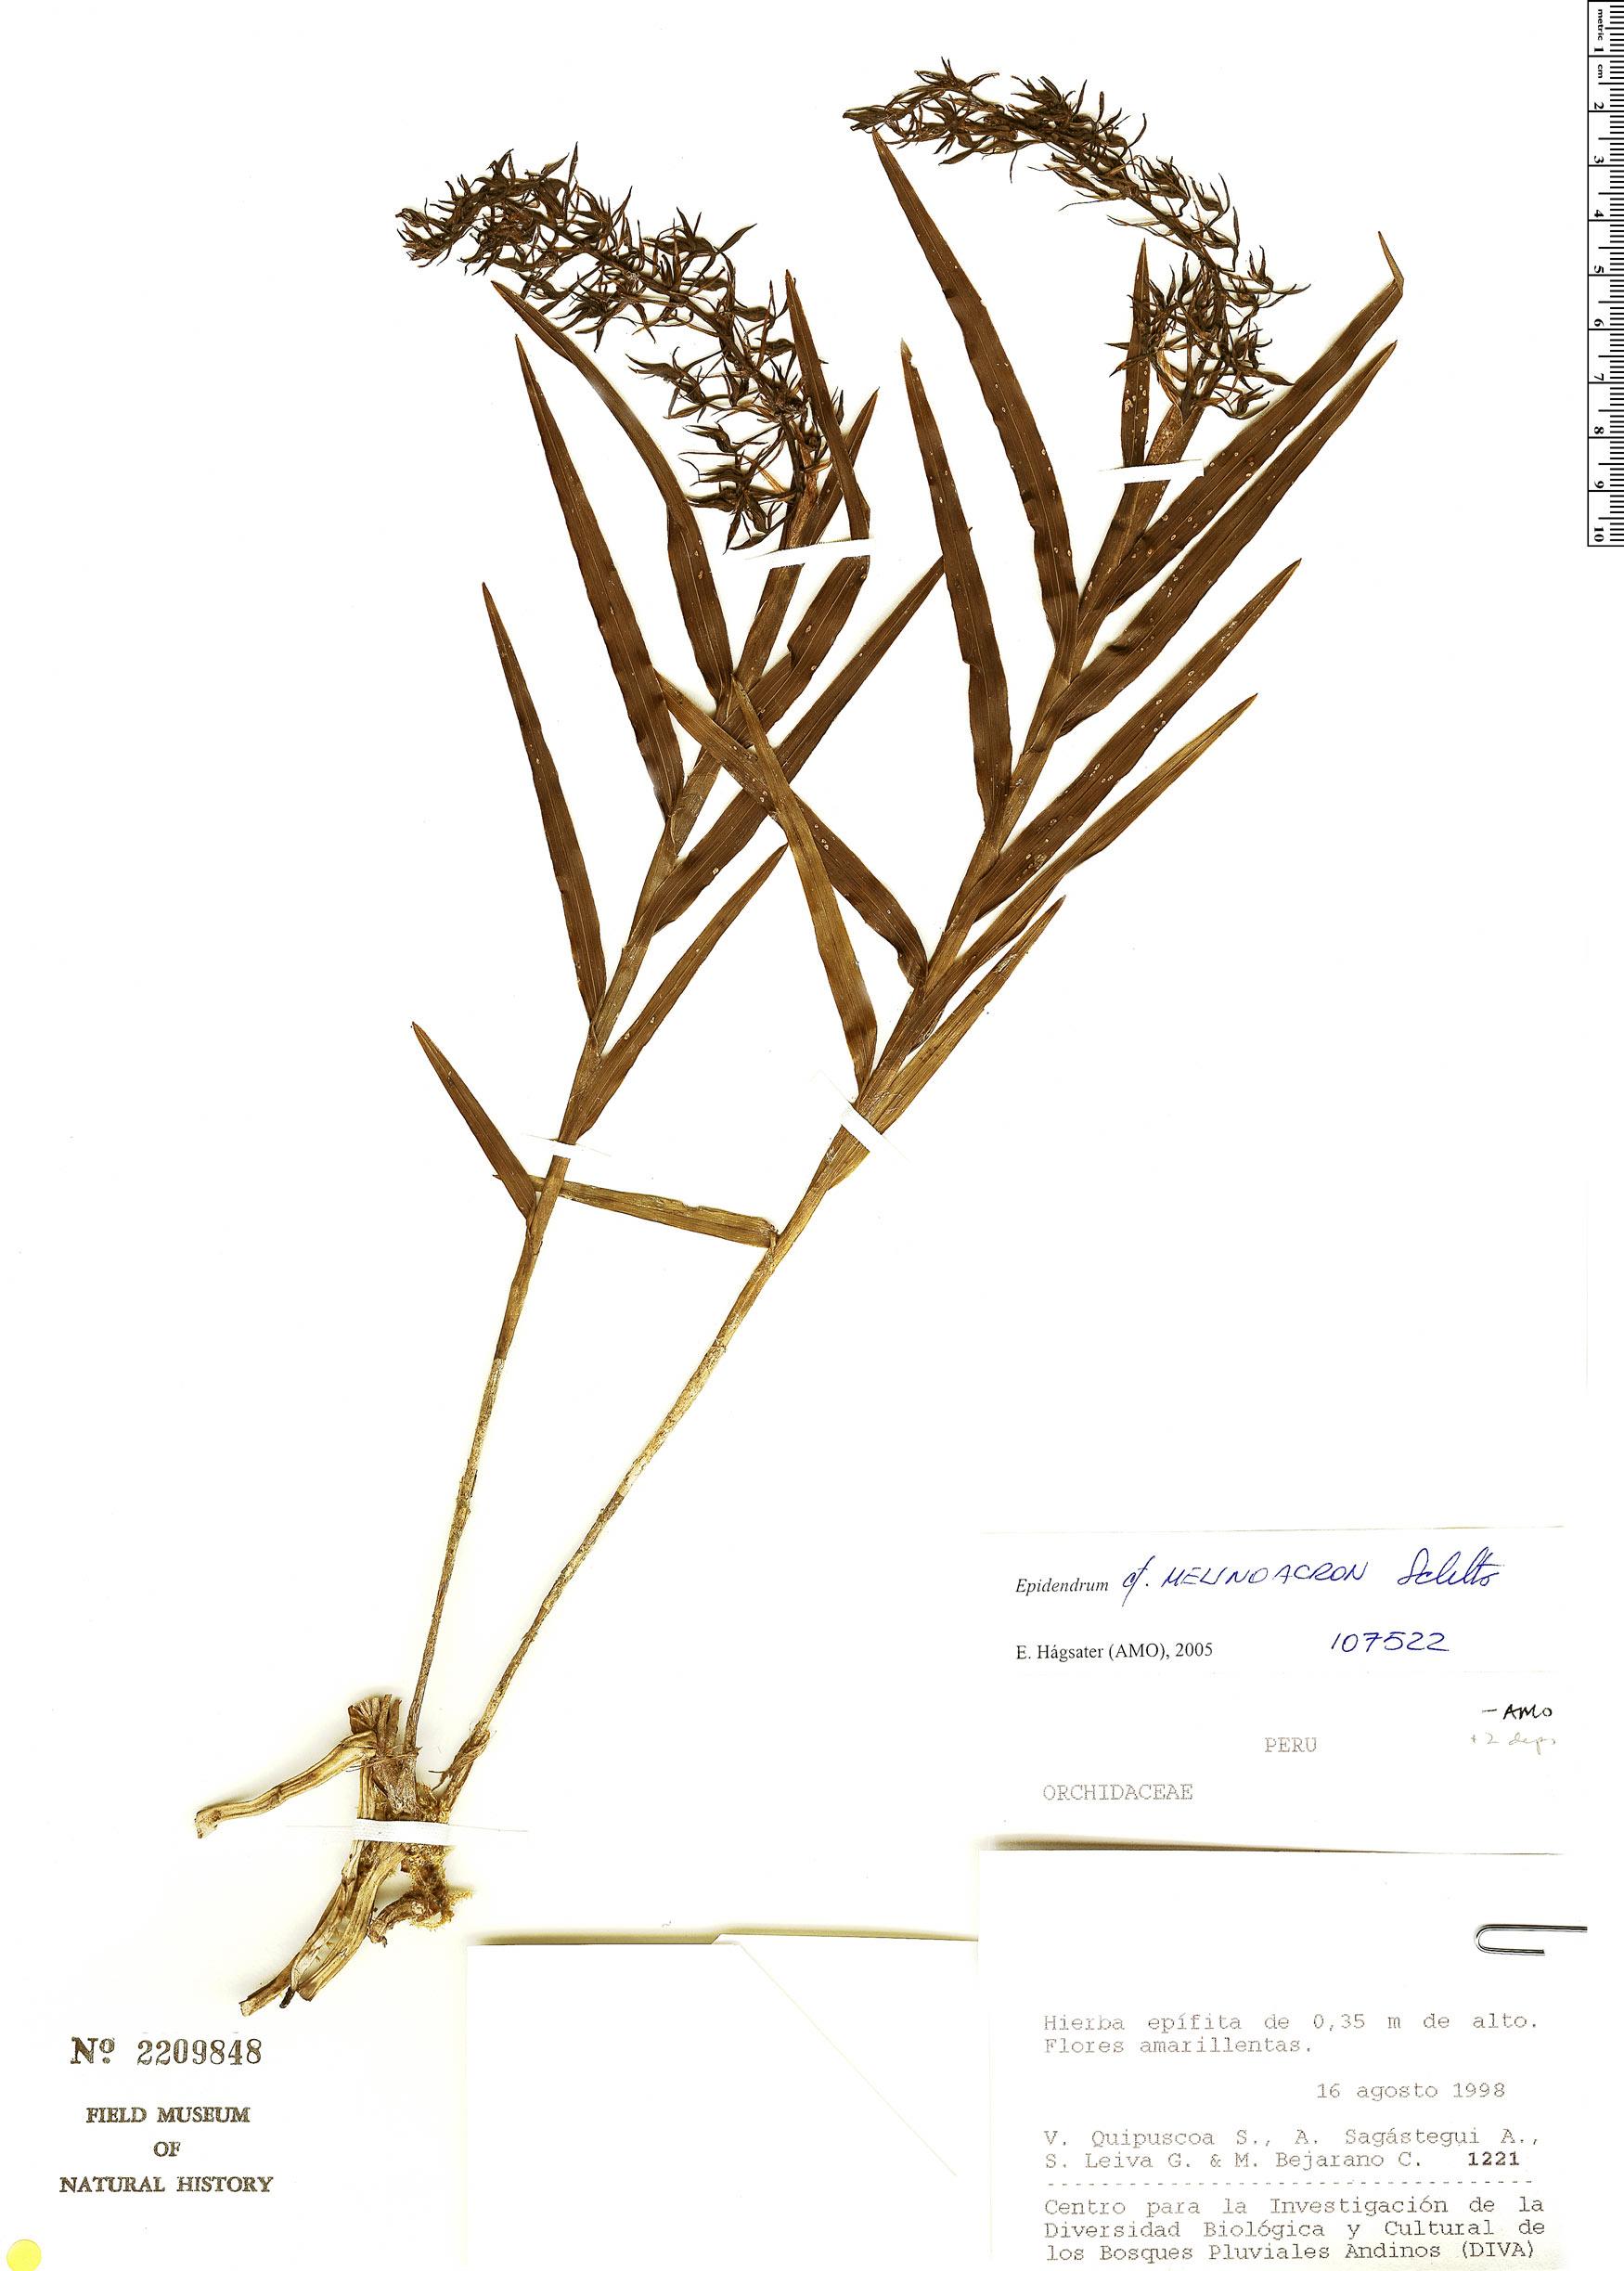 Specimen: Epidendrum melinoacron